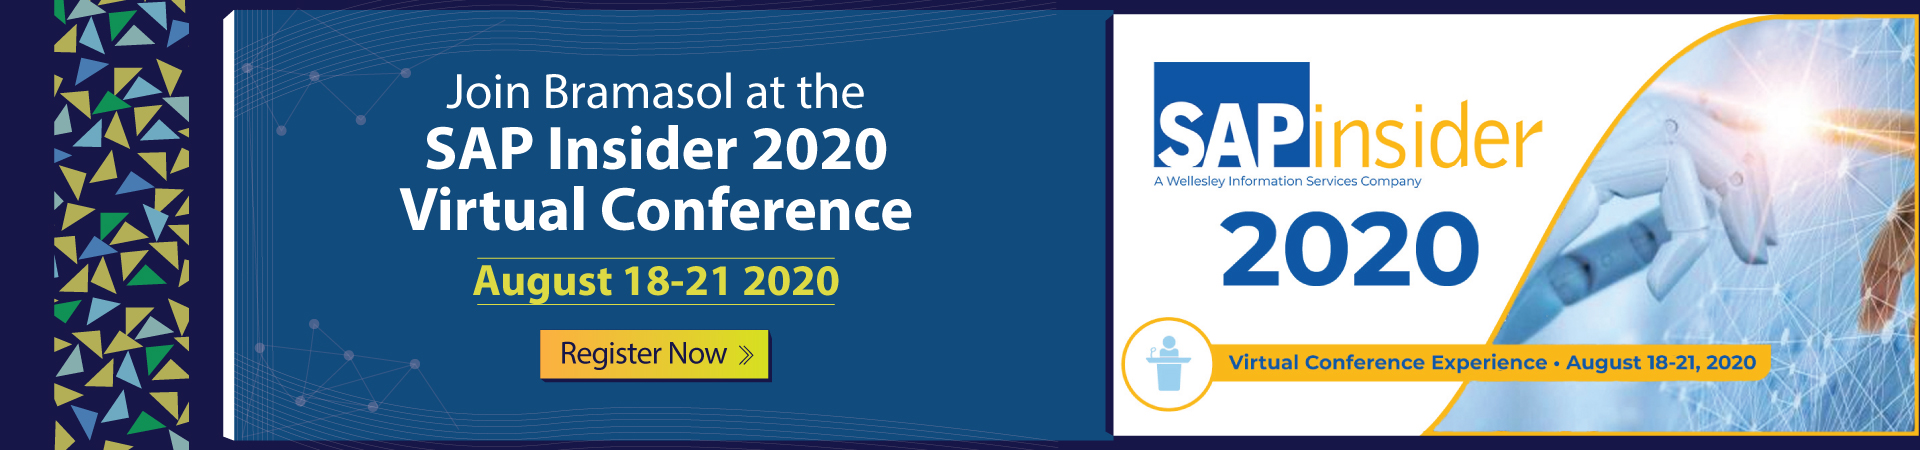 SAP Insider Virtual Conference